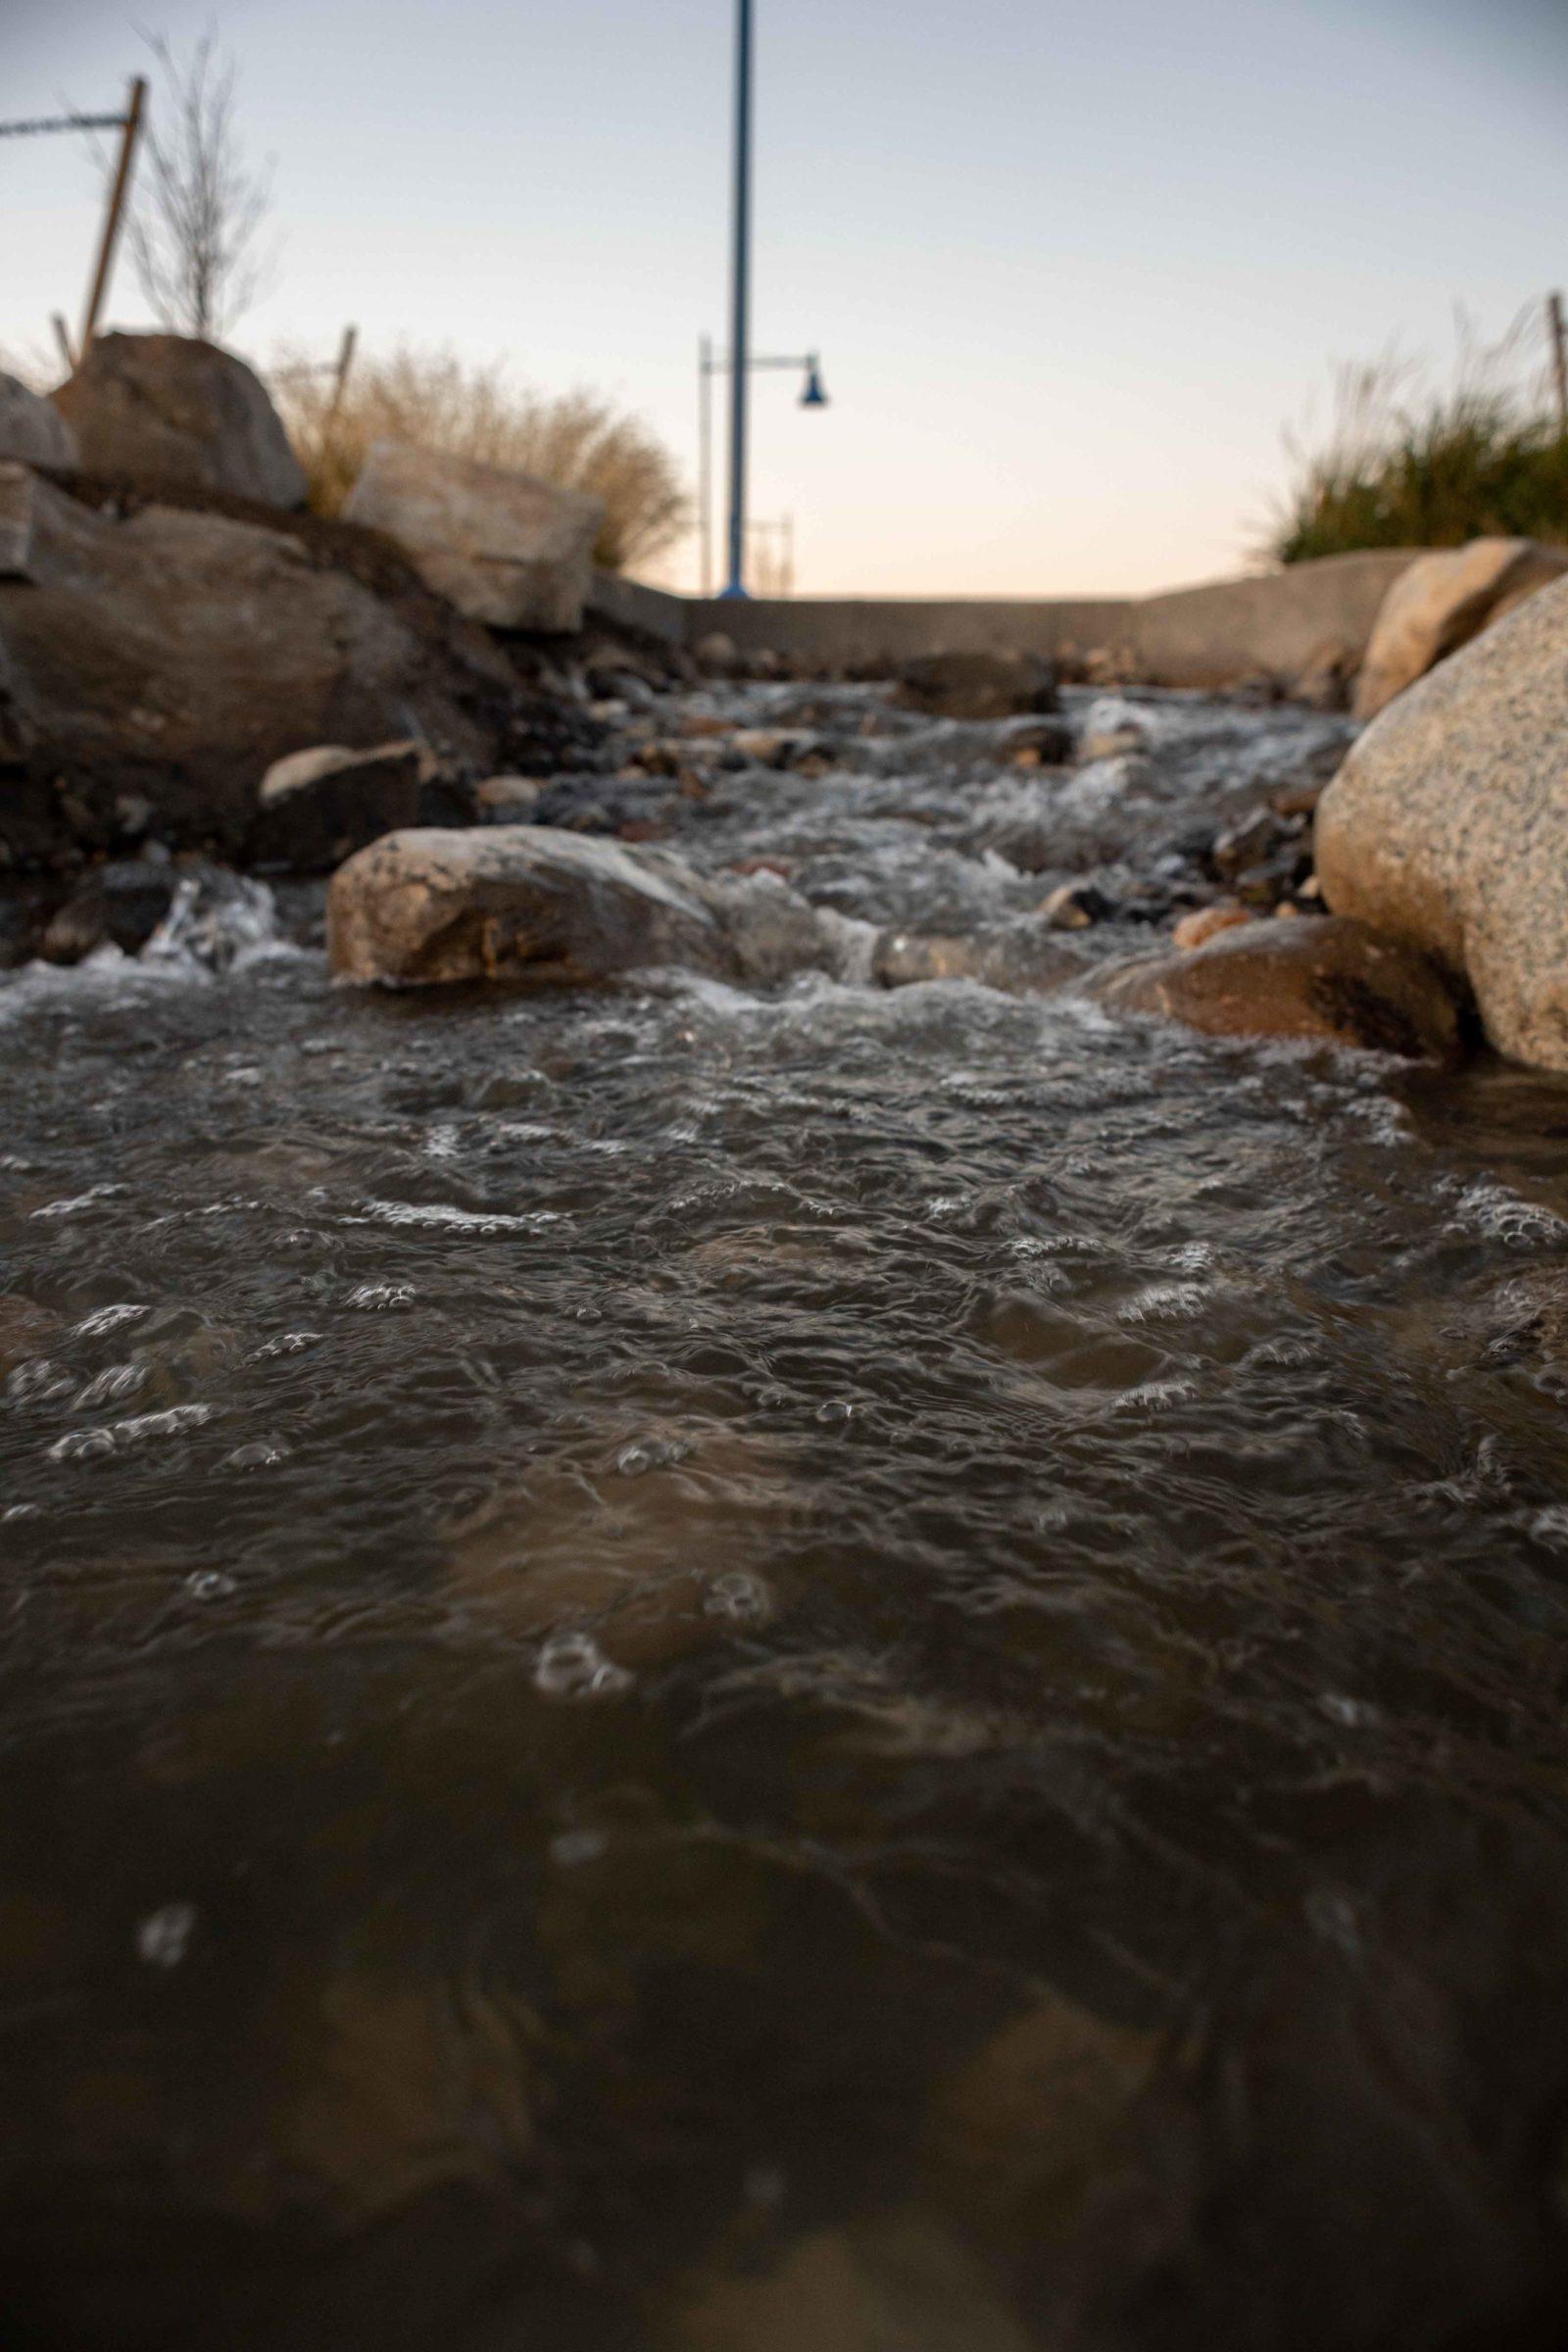 Water spilling over rocks in a Vista Field waterway.